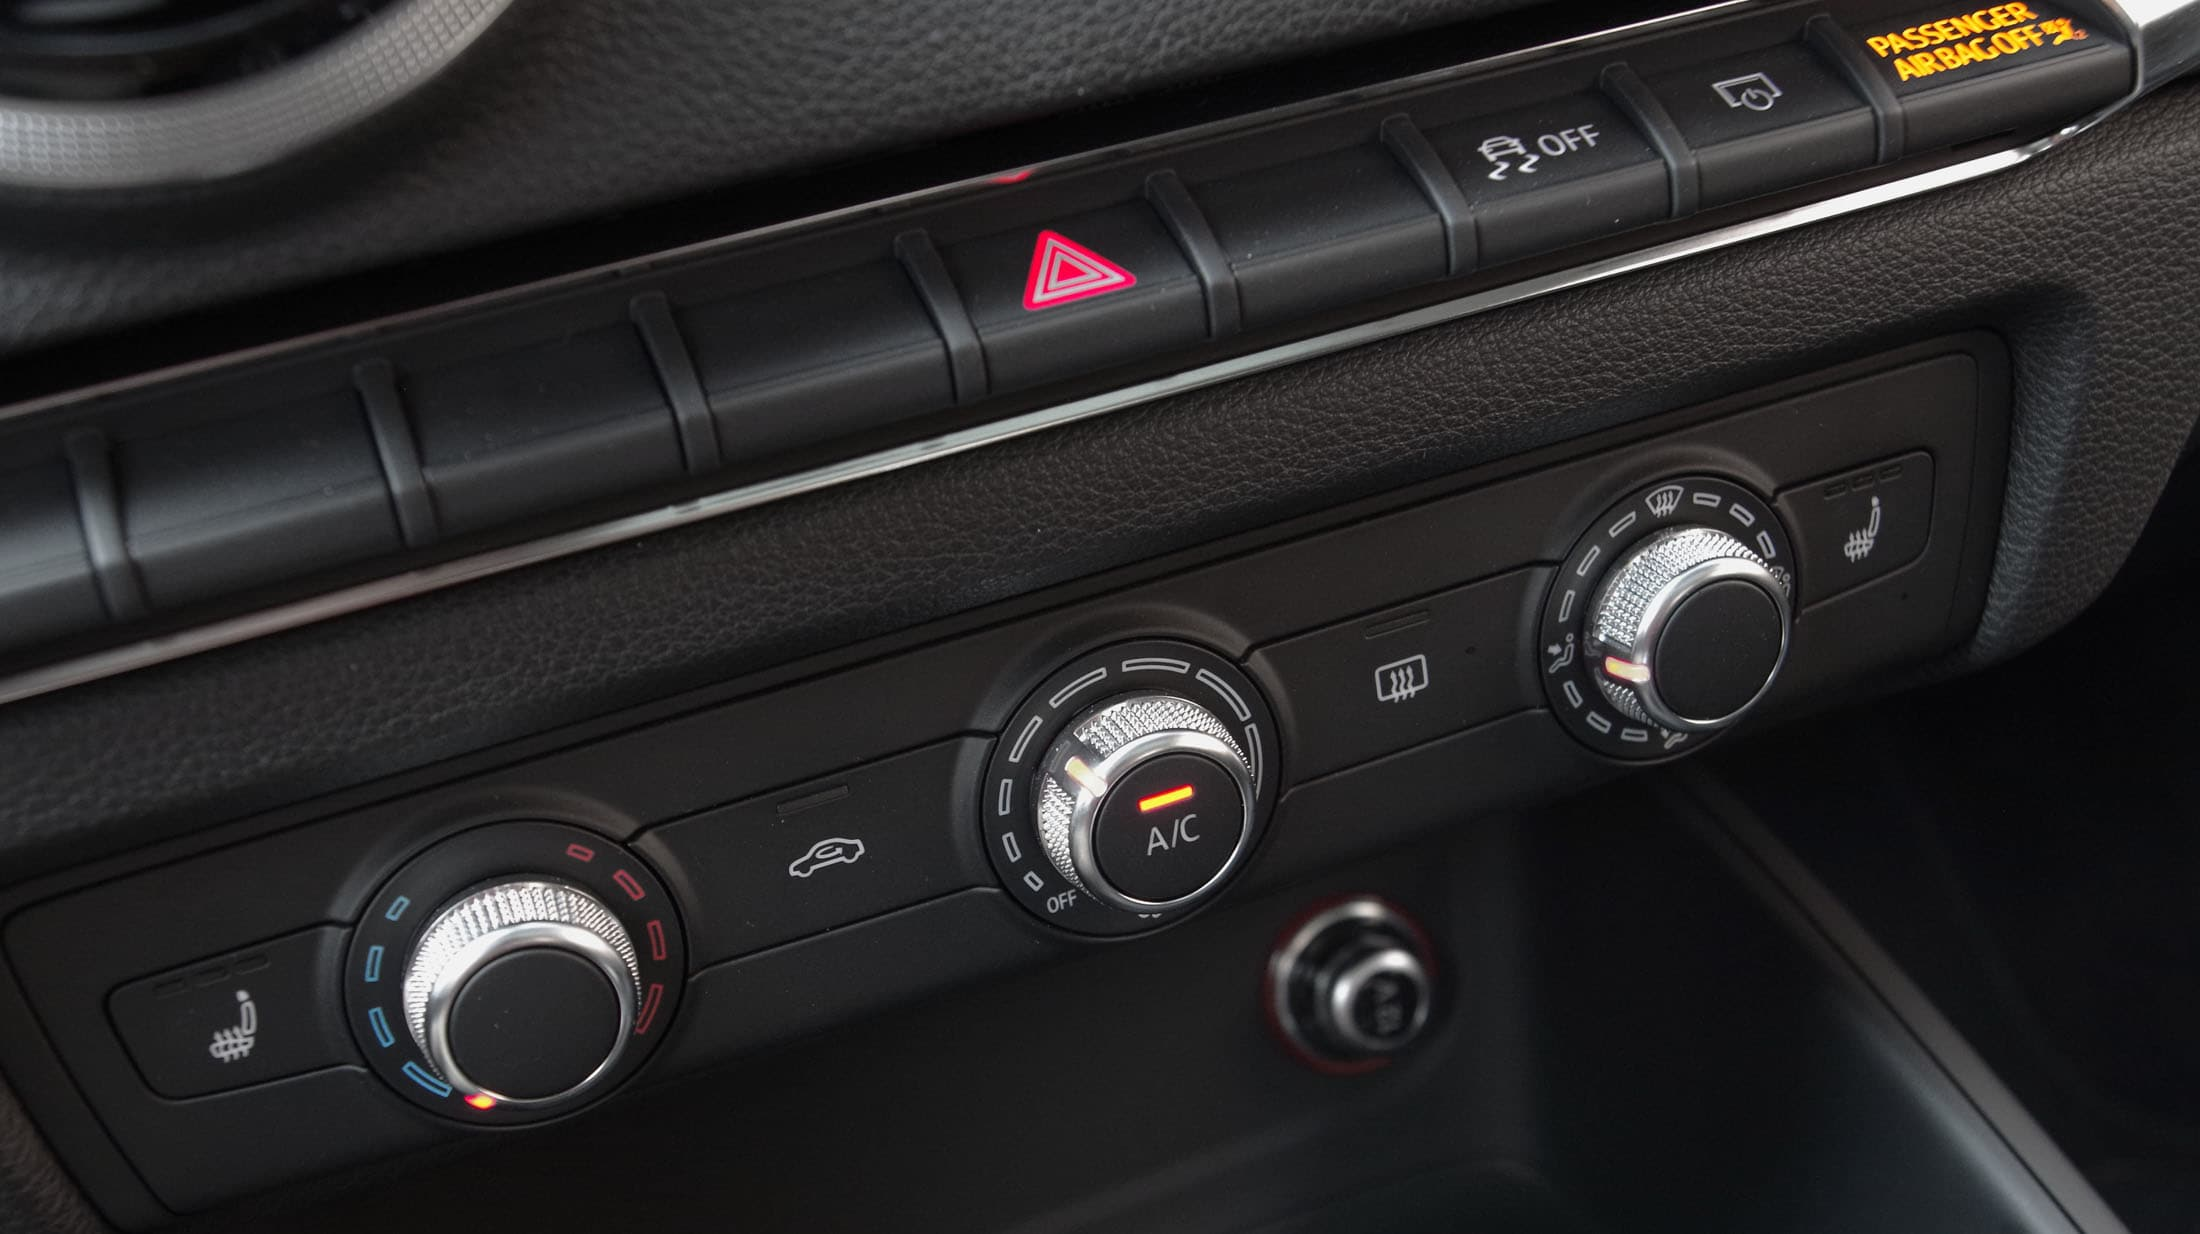 2015 Audi A3 manual climate controls